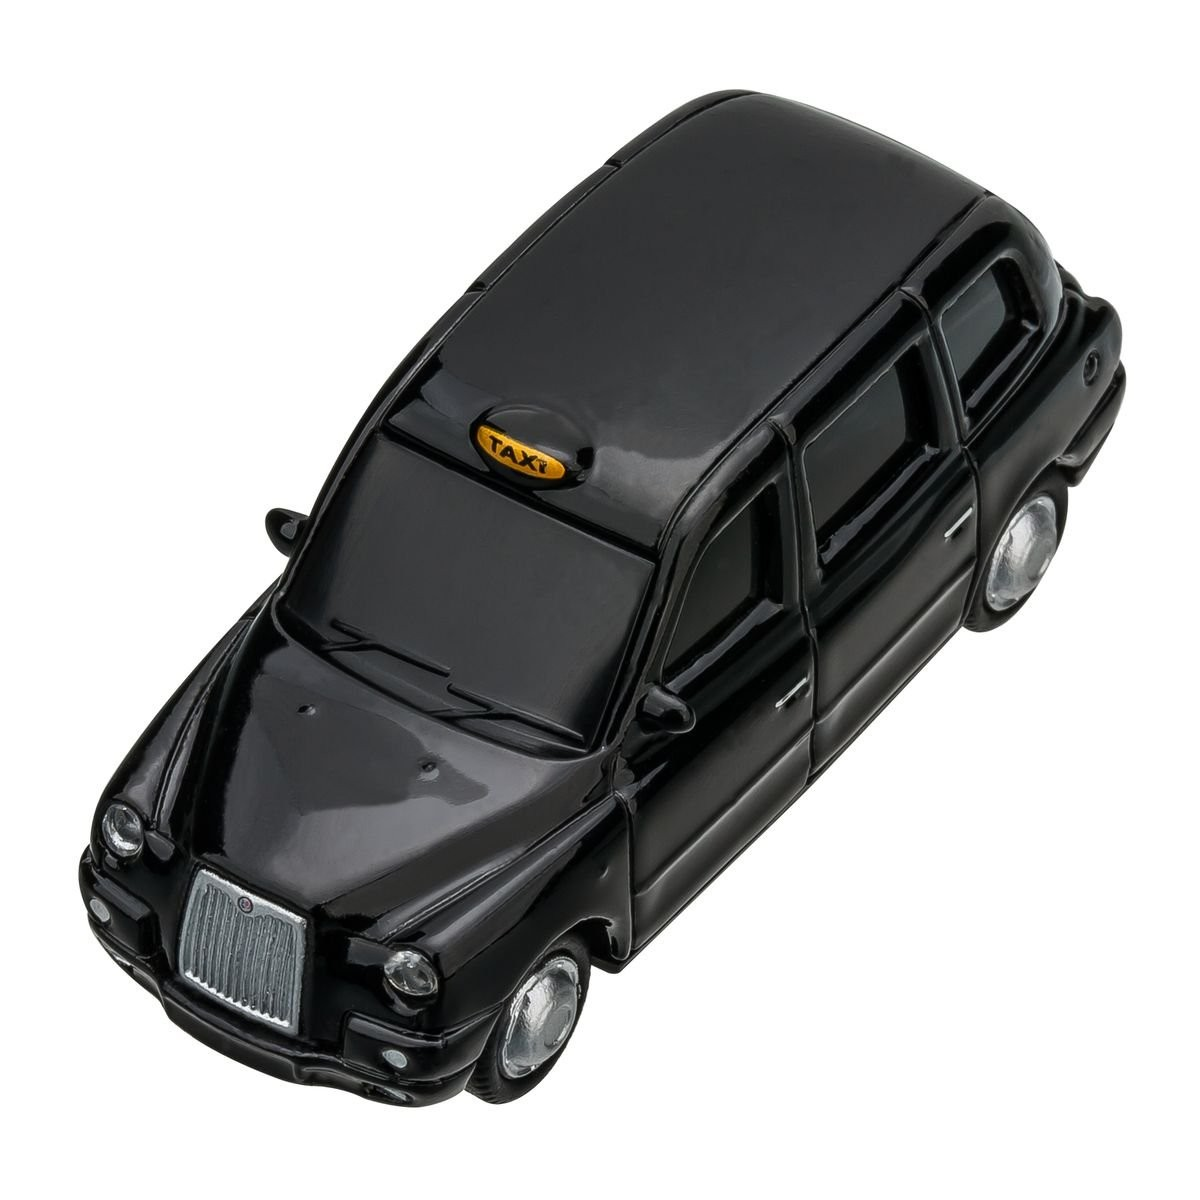 USB-Speicherstick London Taxi TX4 1:72 BLACK 16GB, Ansicht 8